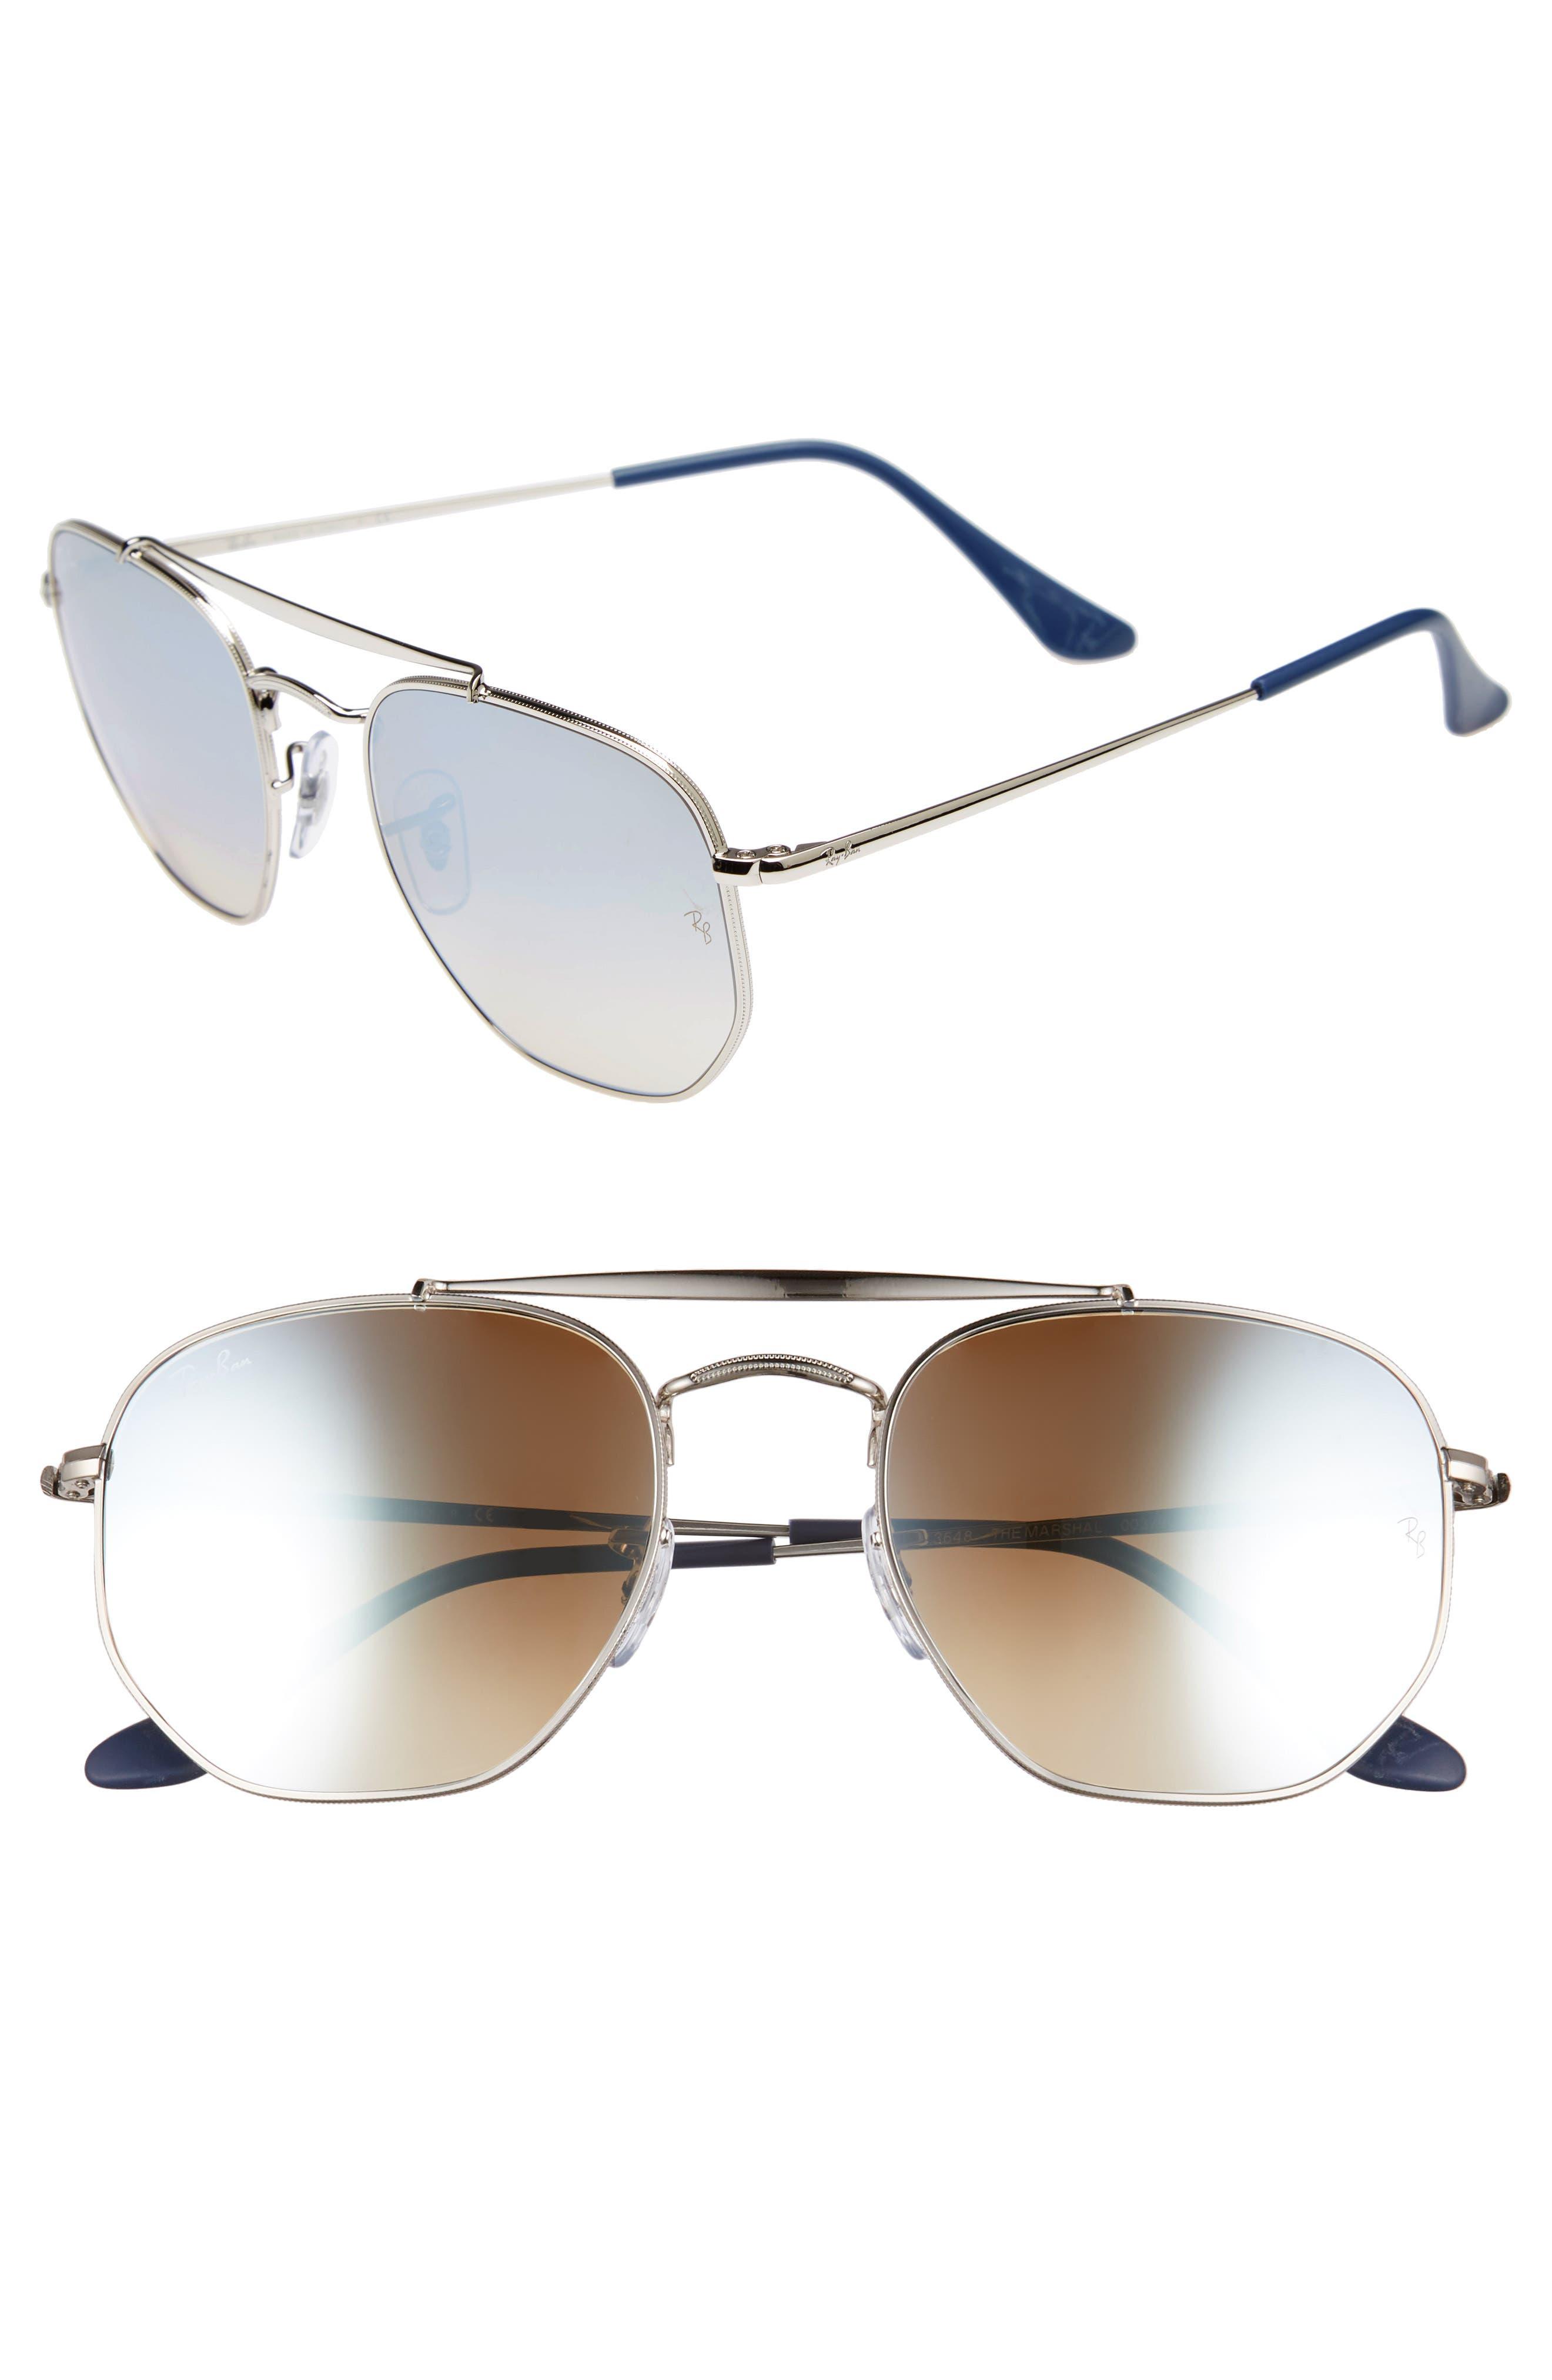 Marshal 54mm Aviator Sunglasses,                         Main,                         color, Silver